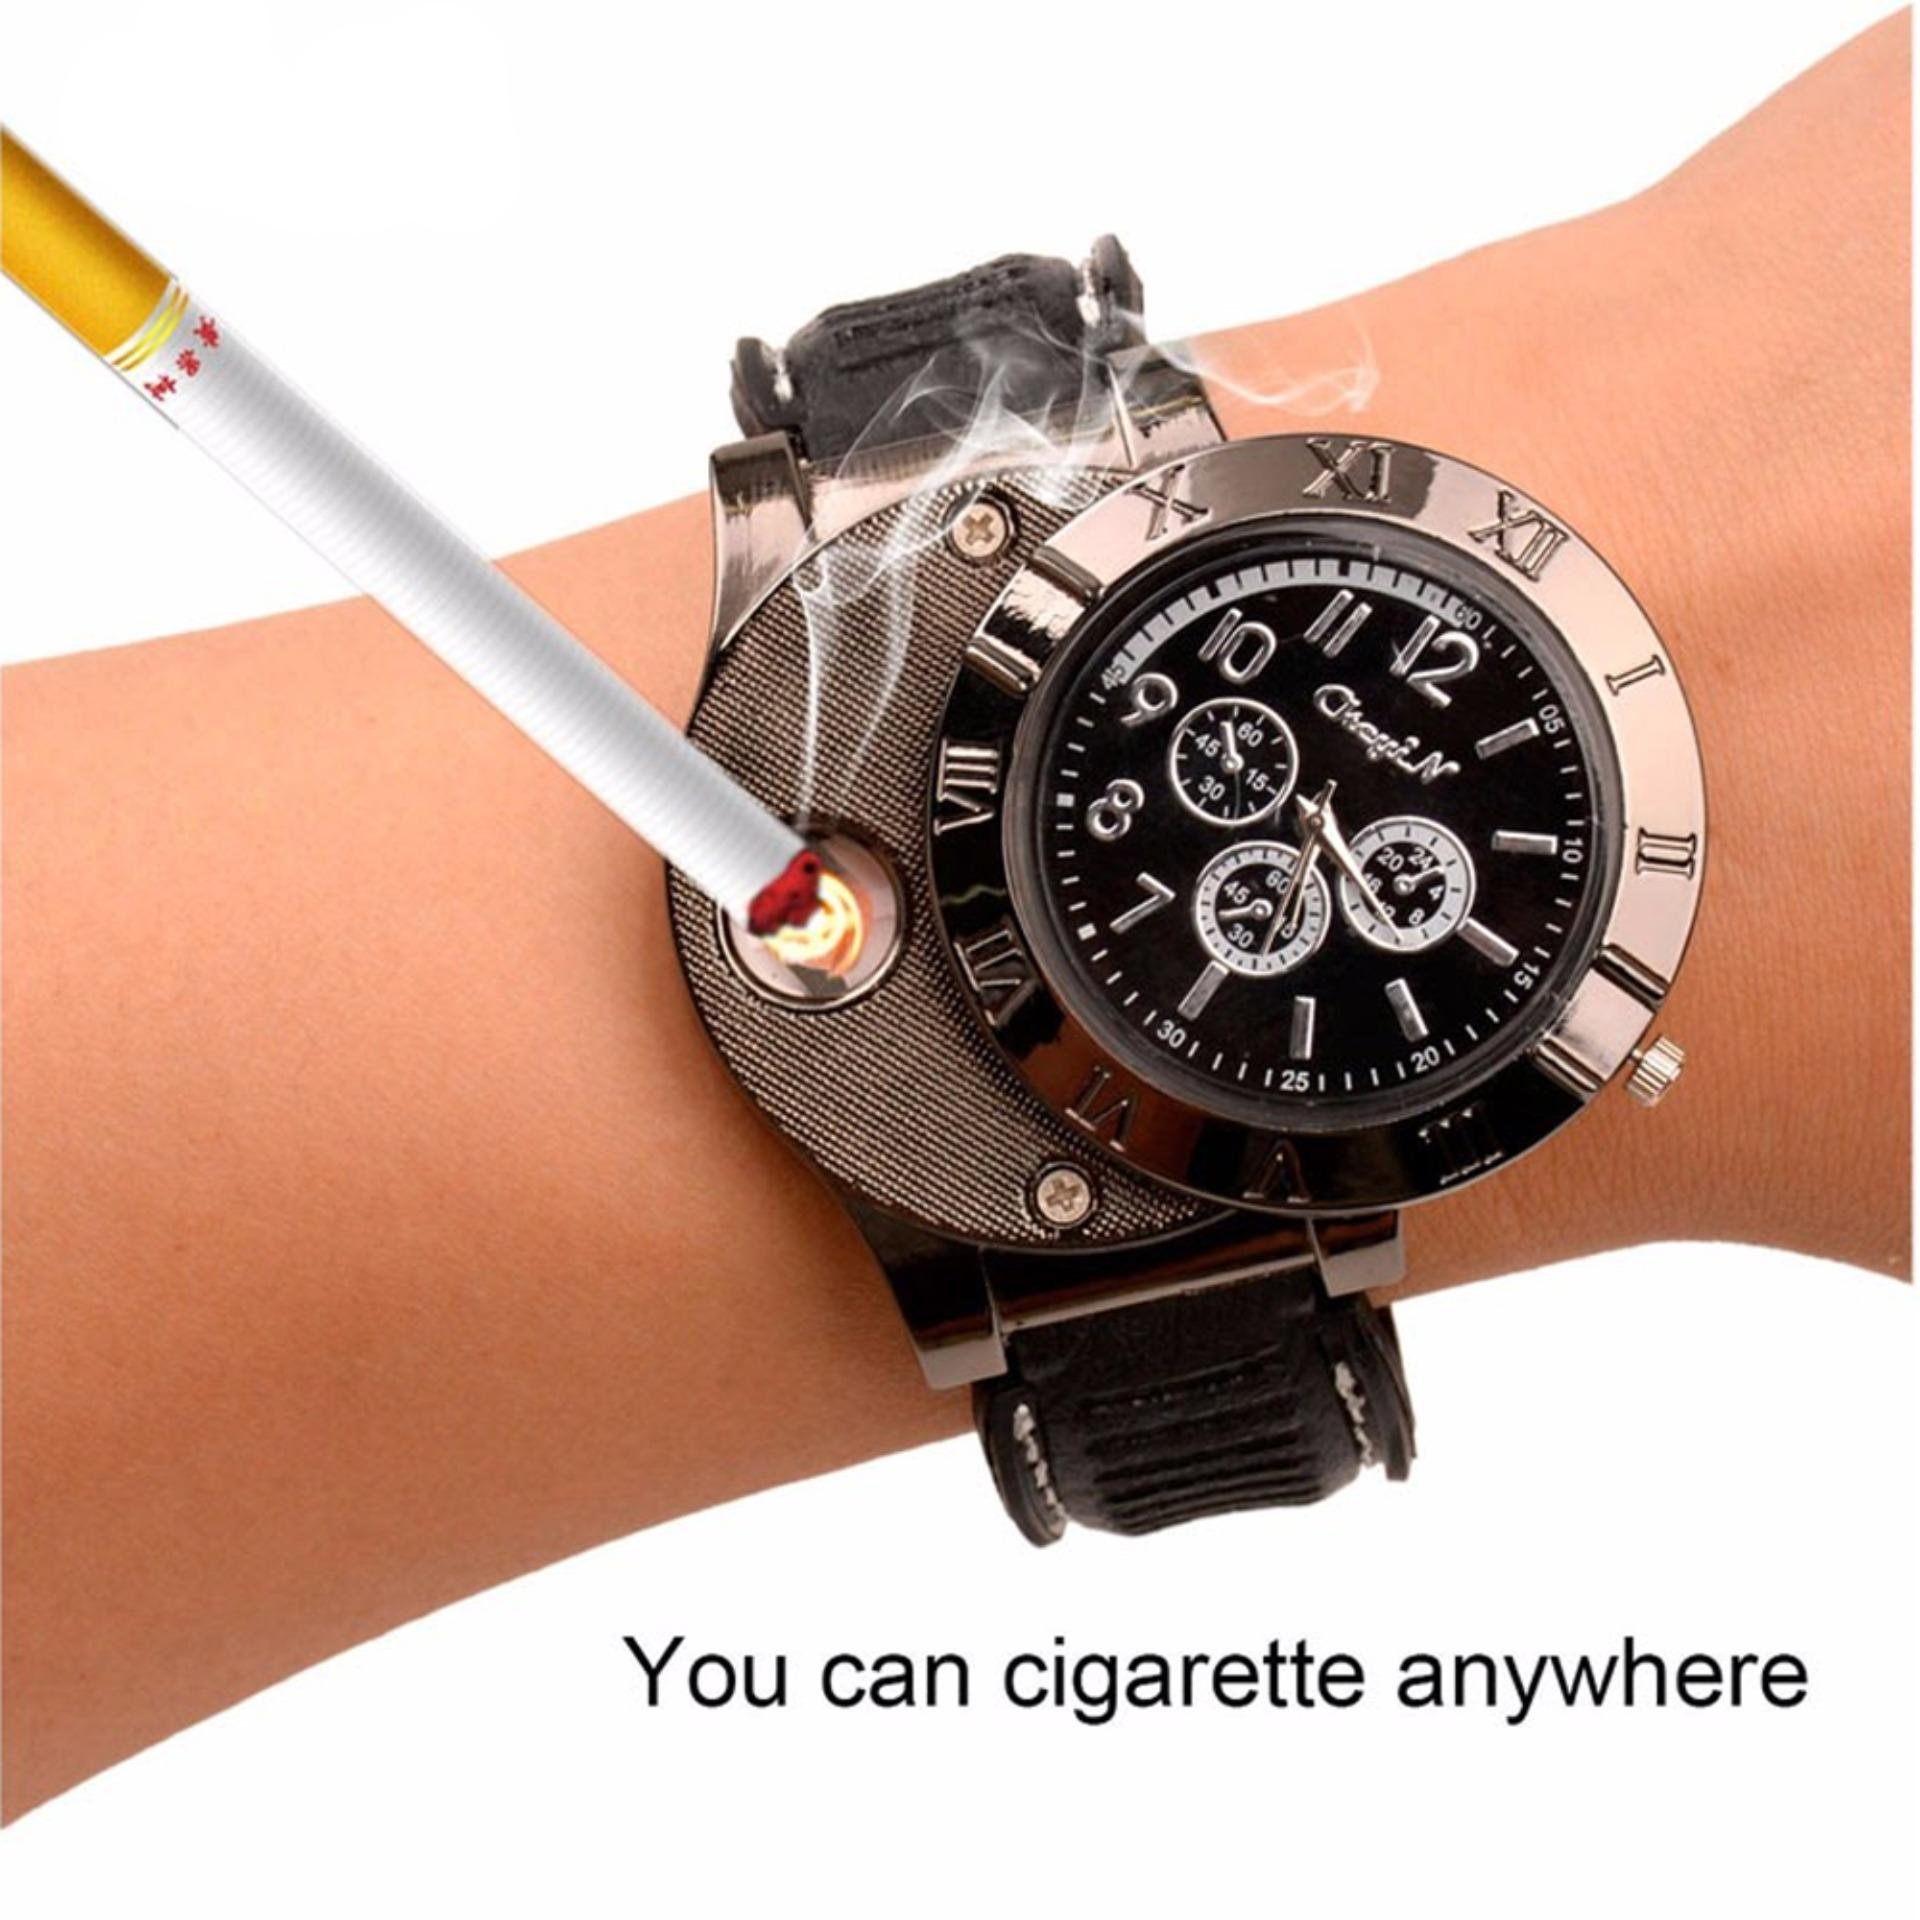 Slalustok Store - Jam Tangan Pria Korek Elektrik Usb Api Rokok Cigarrete Lighter Watch Jam Tangan Analog By Slalustok Store.